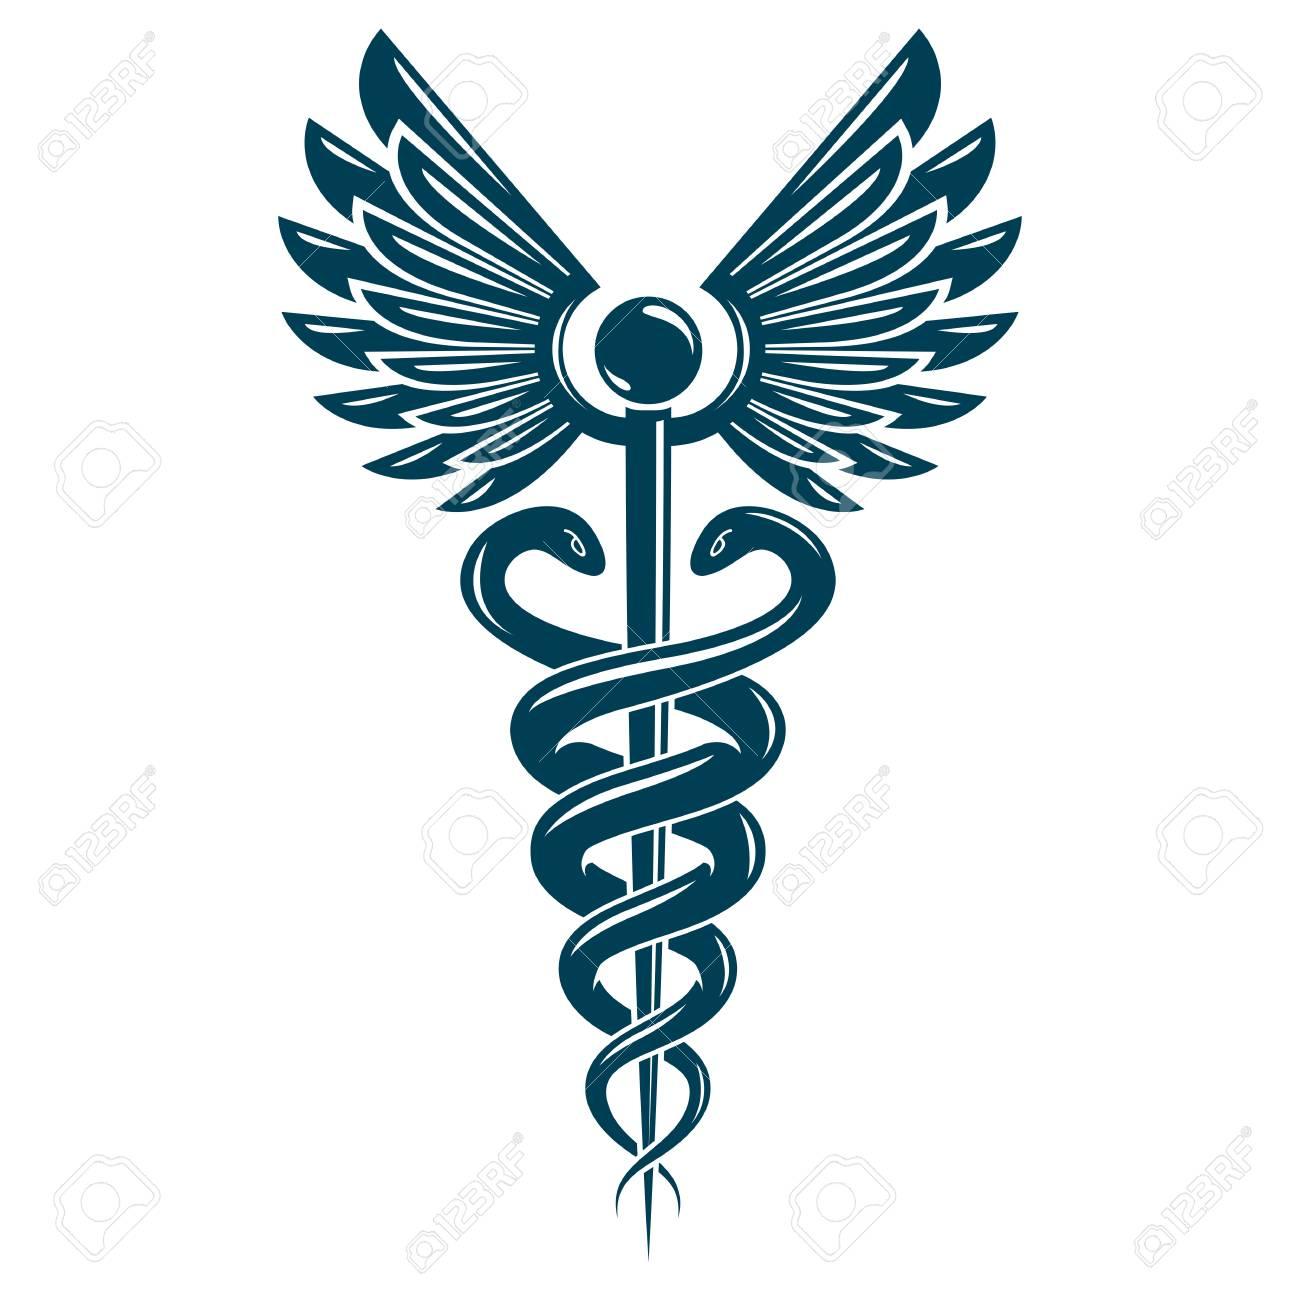 caduceus symbol made using bird wings and poisonous snakes rh 123rf com